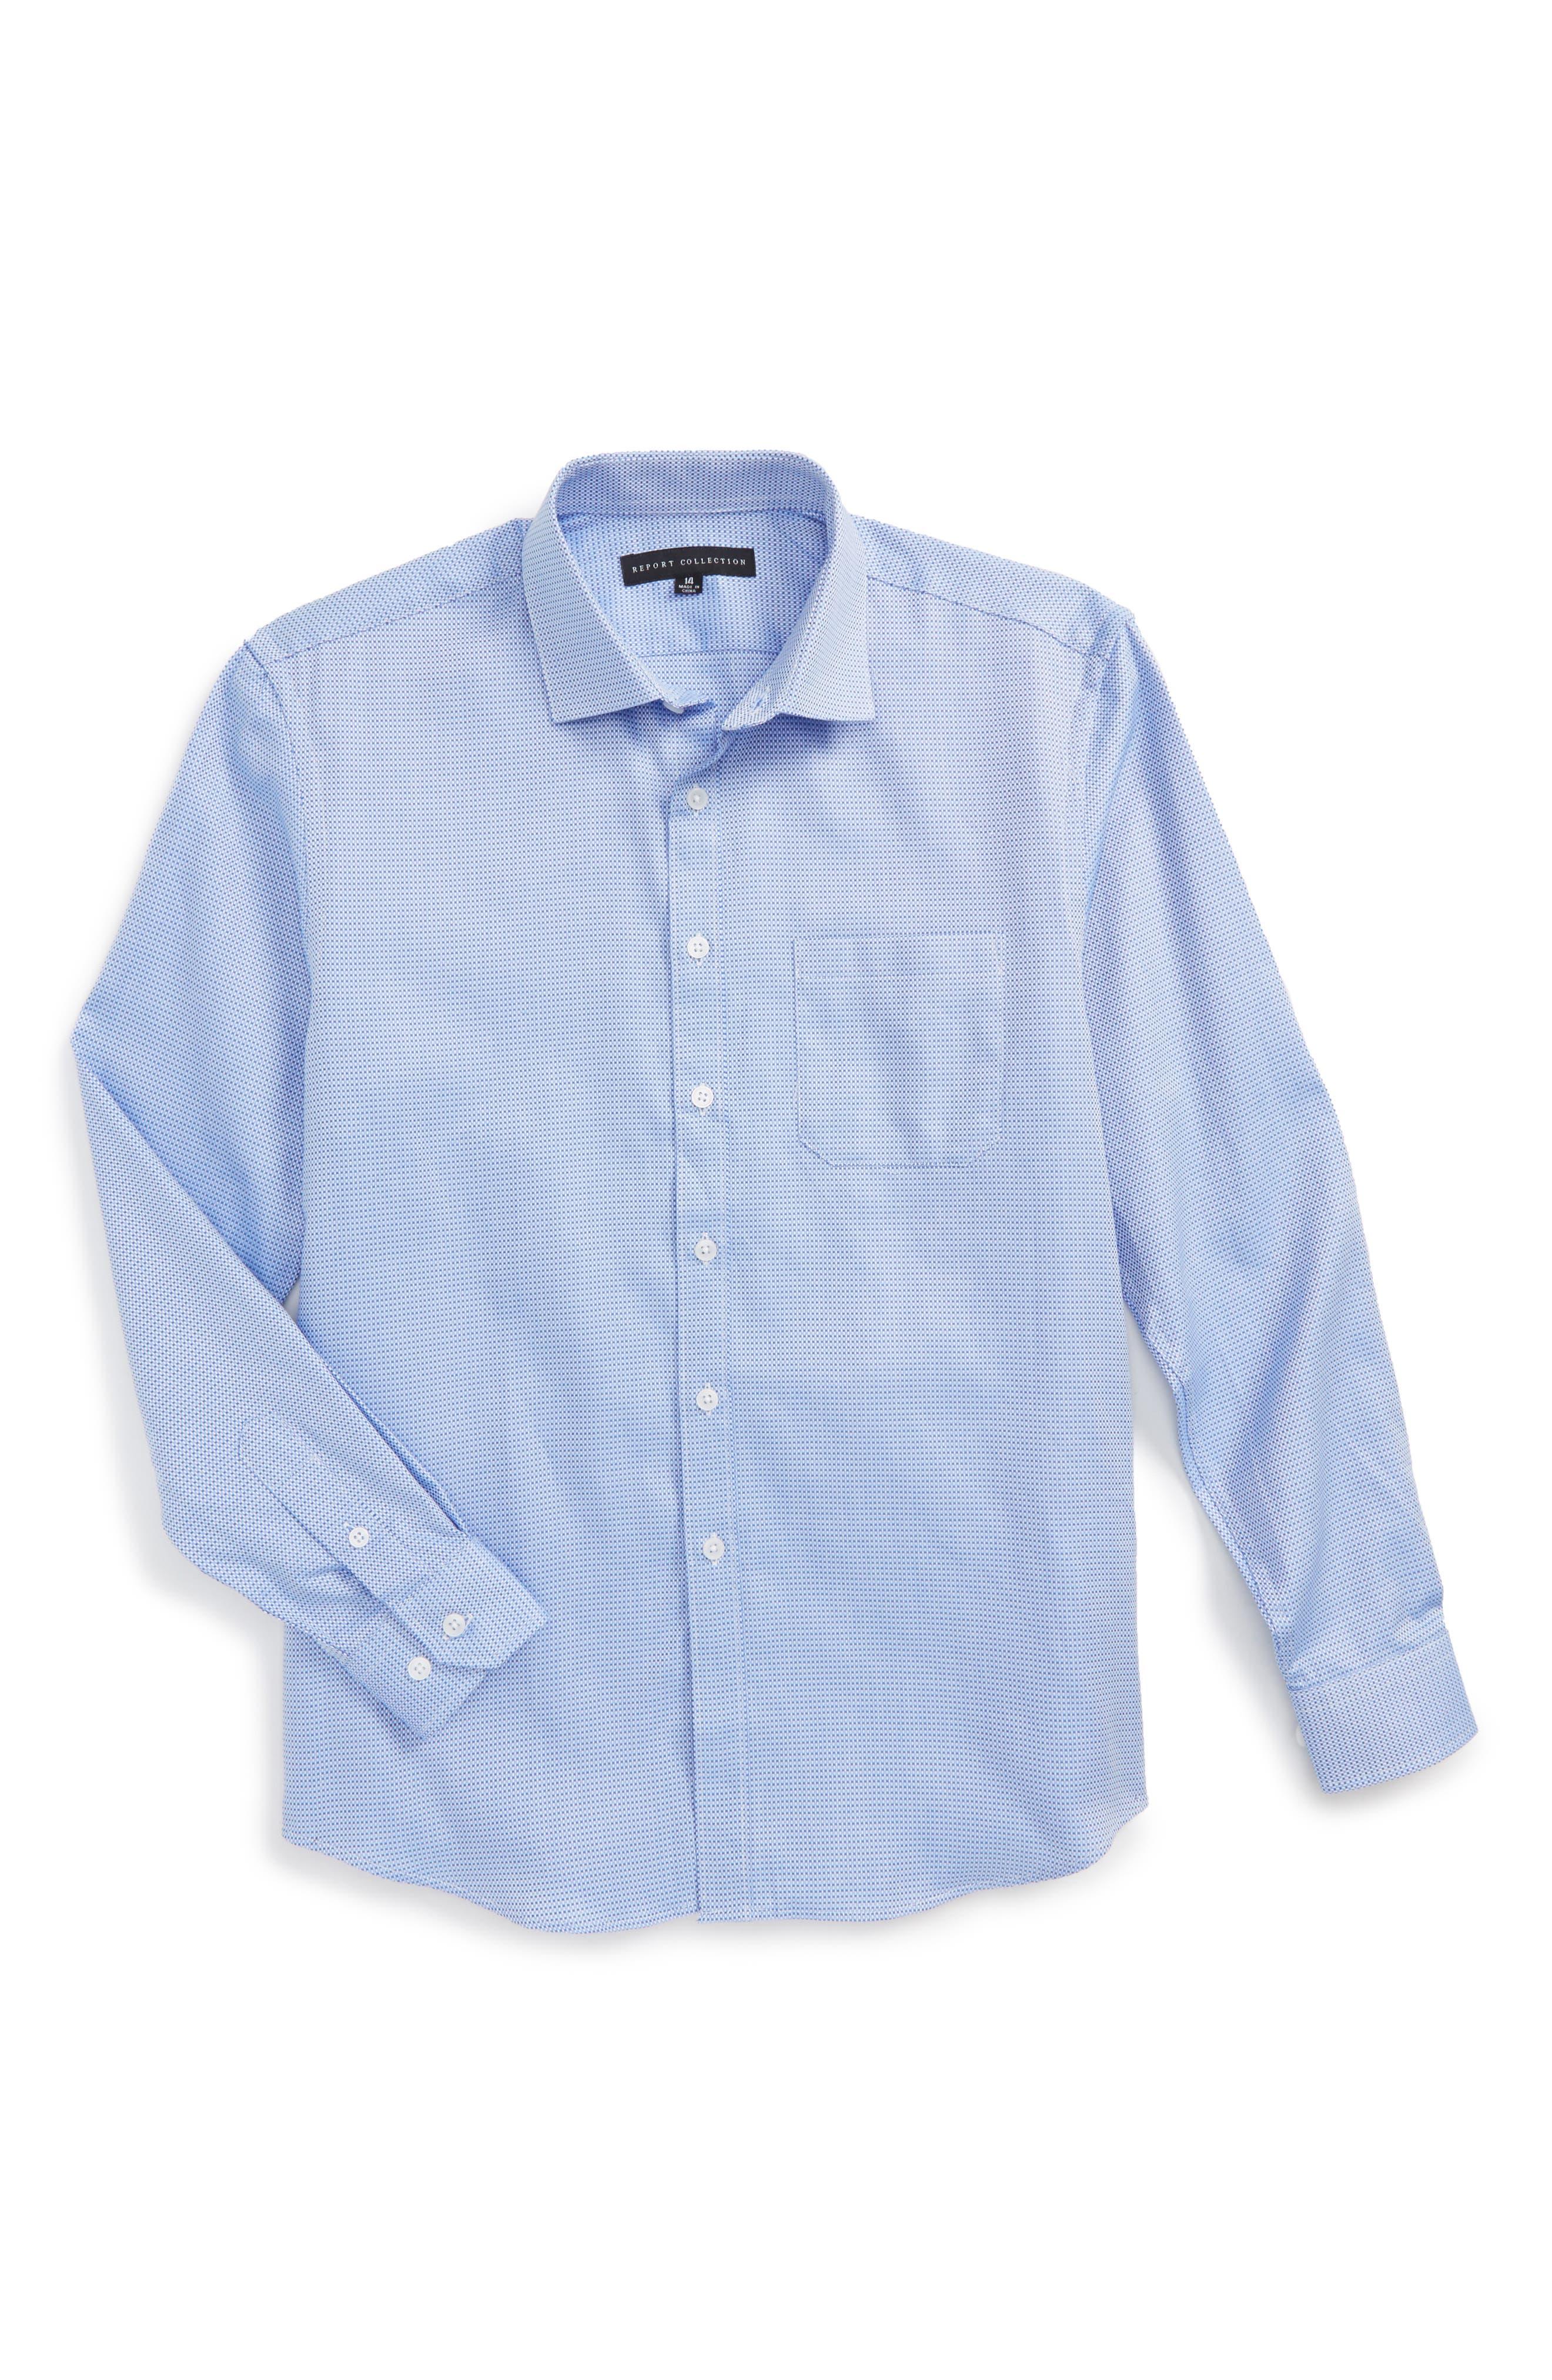 Textured Dress Shirt,                             Main thumbnail 1, color,